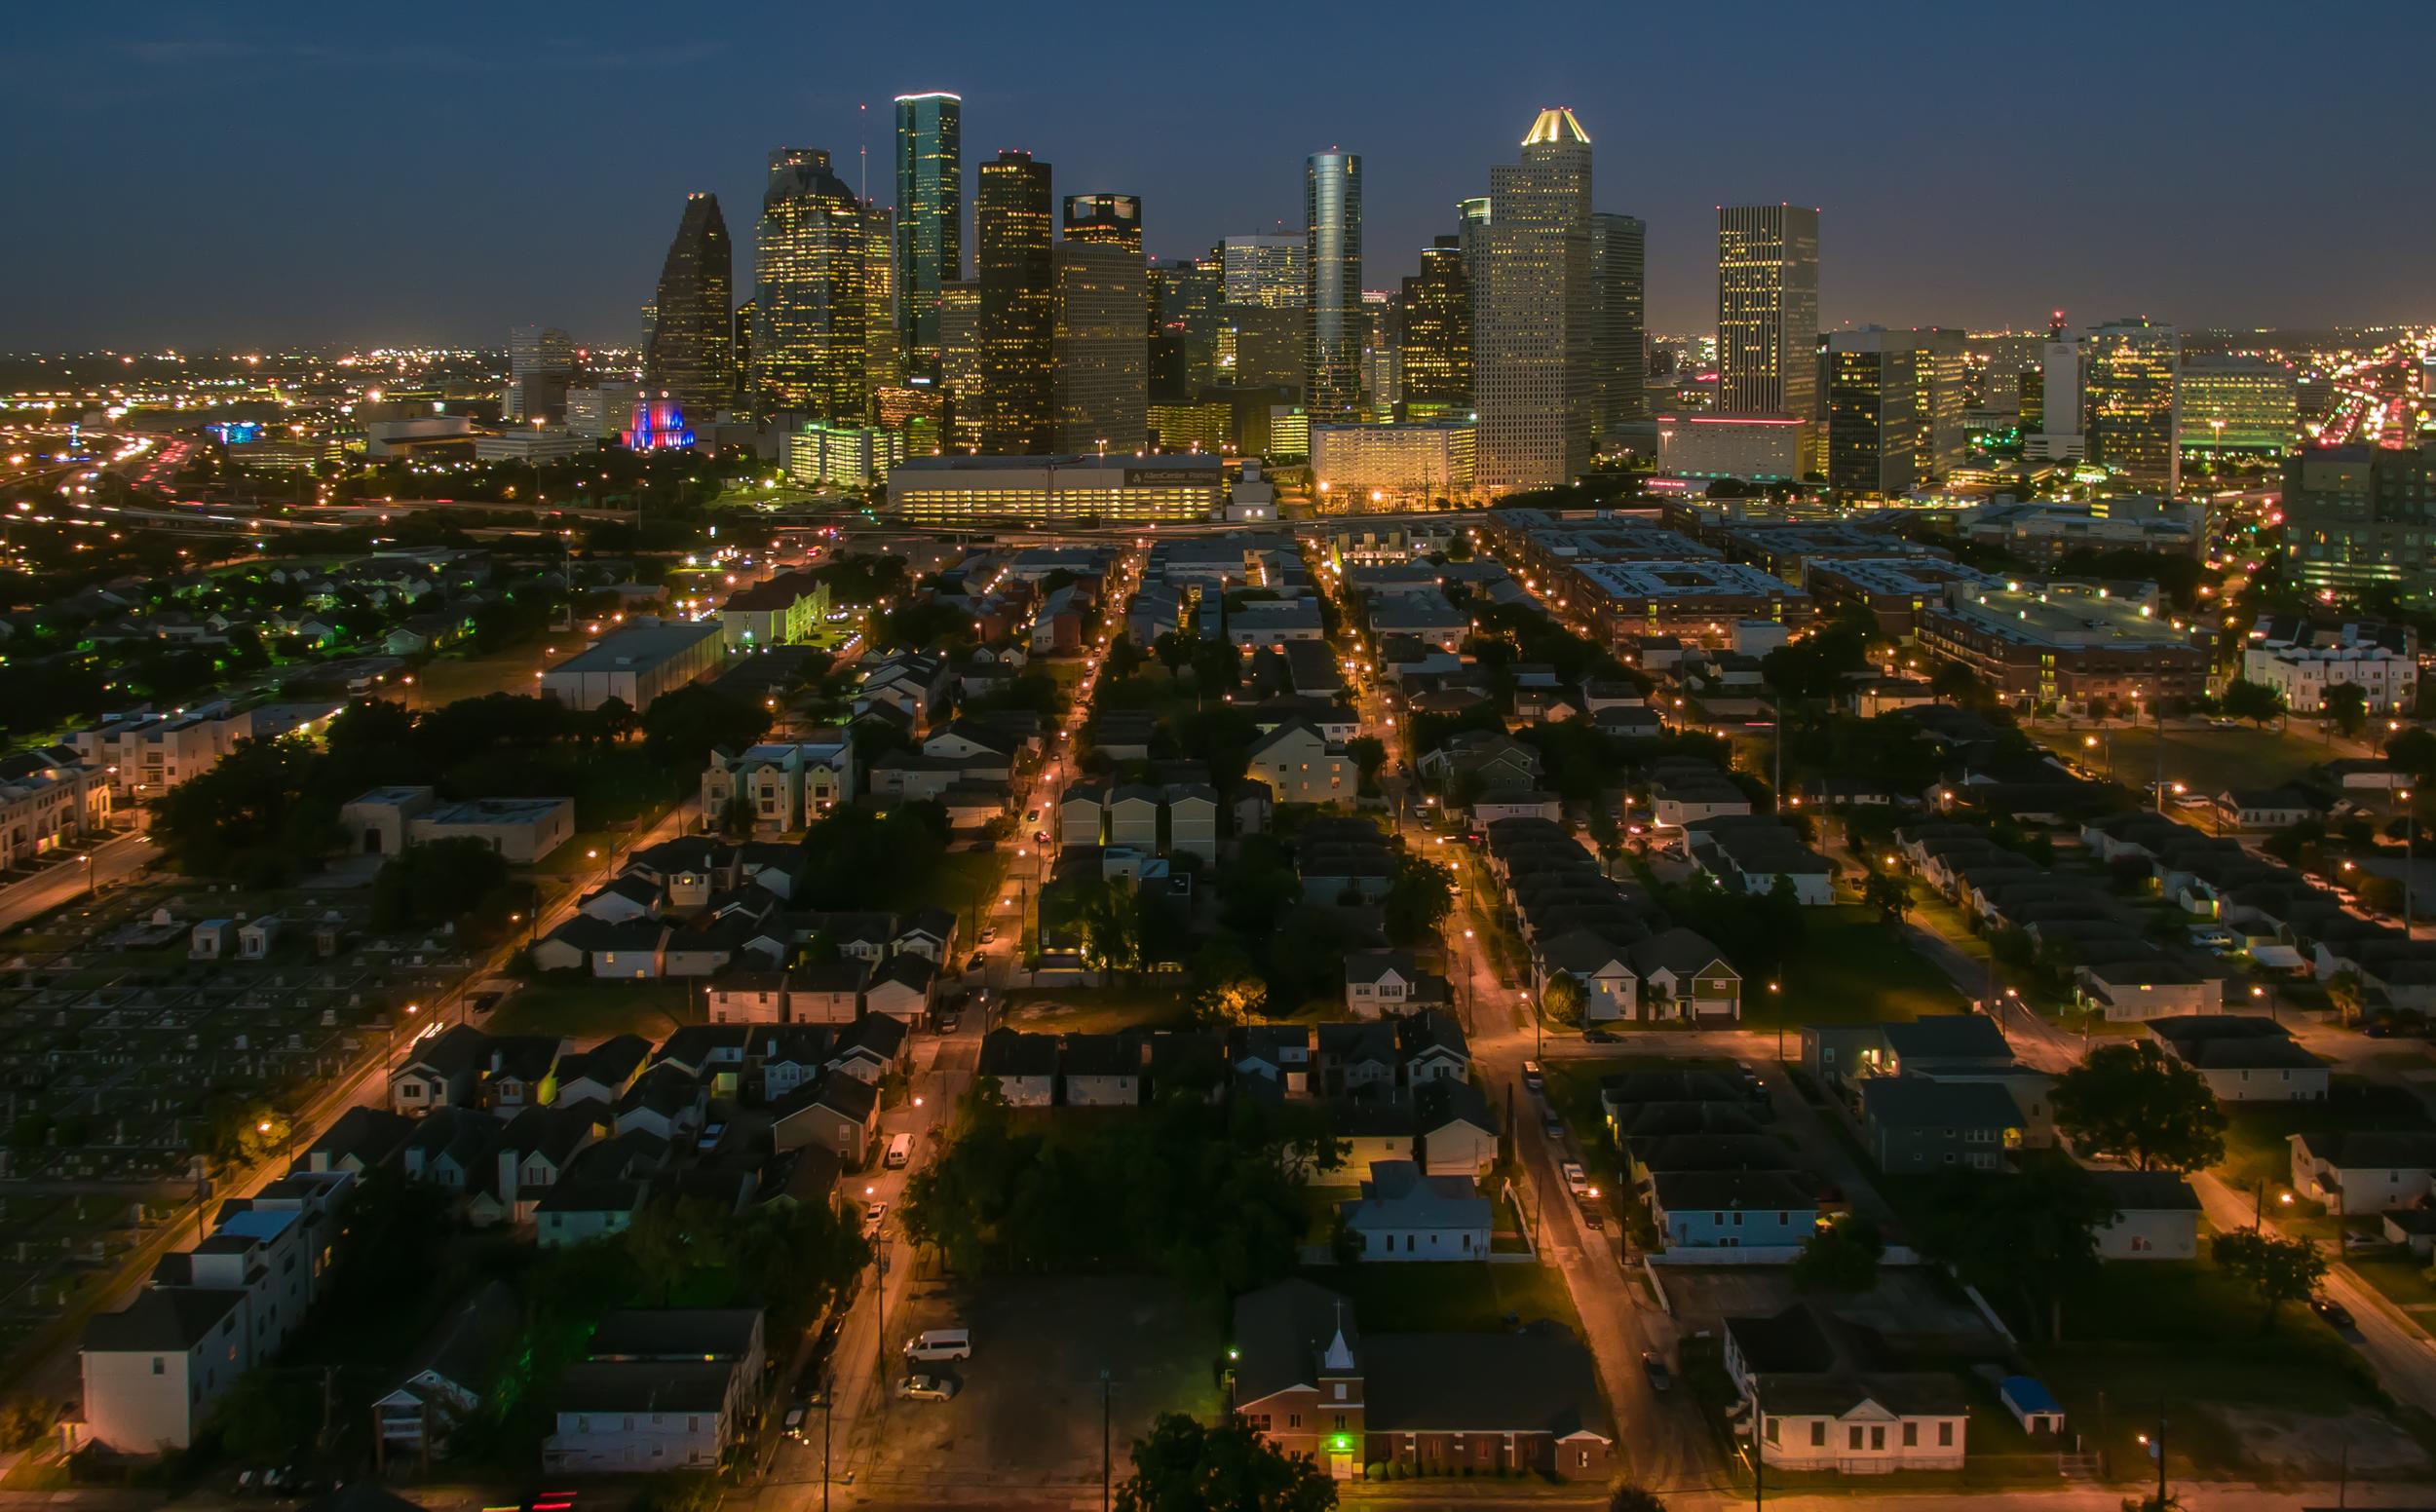 Urban Skyline at NIght Jim Wiehoff